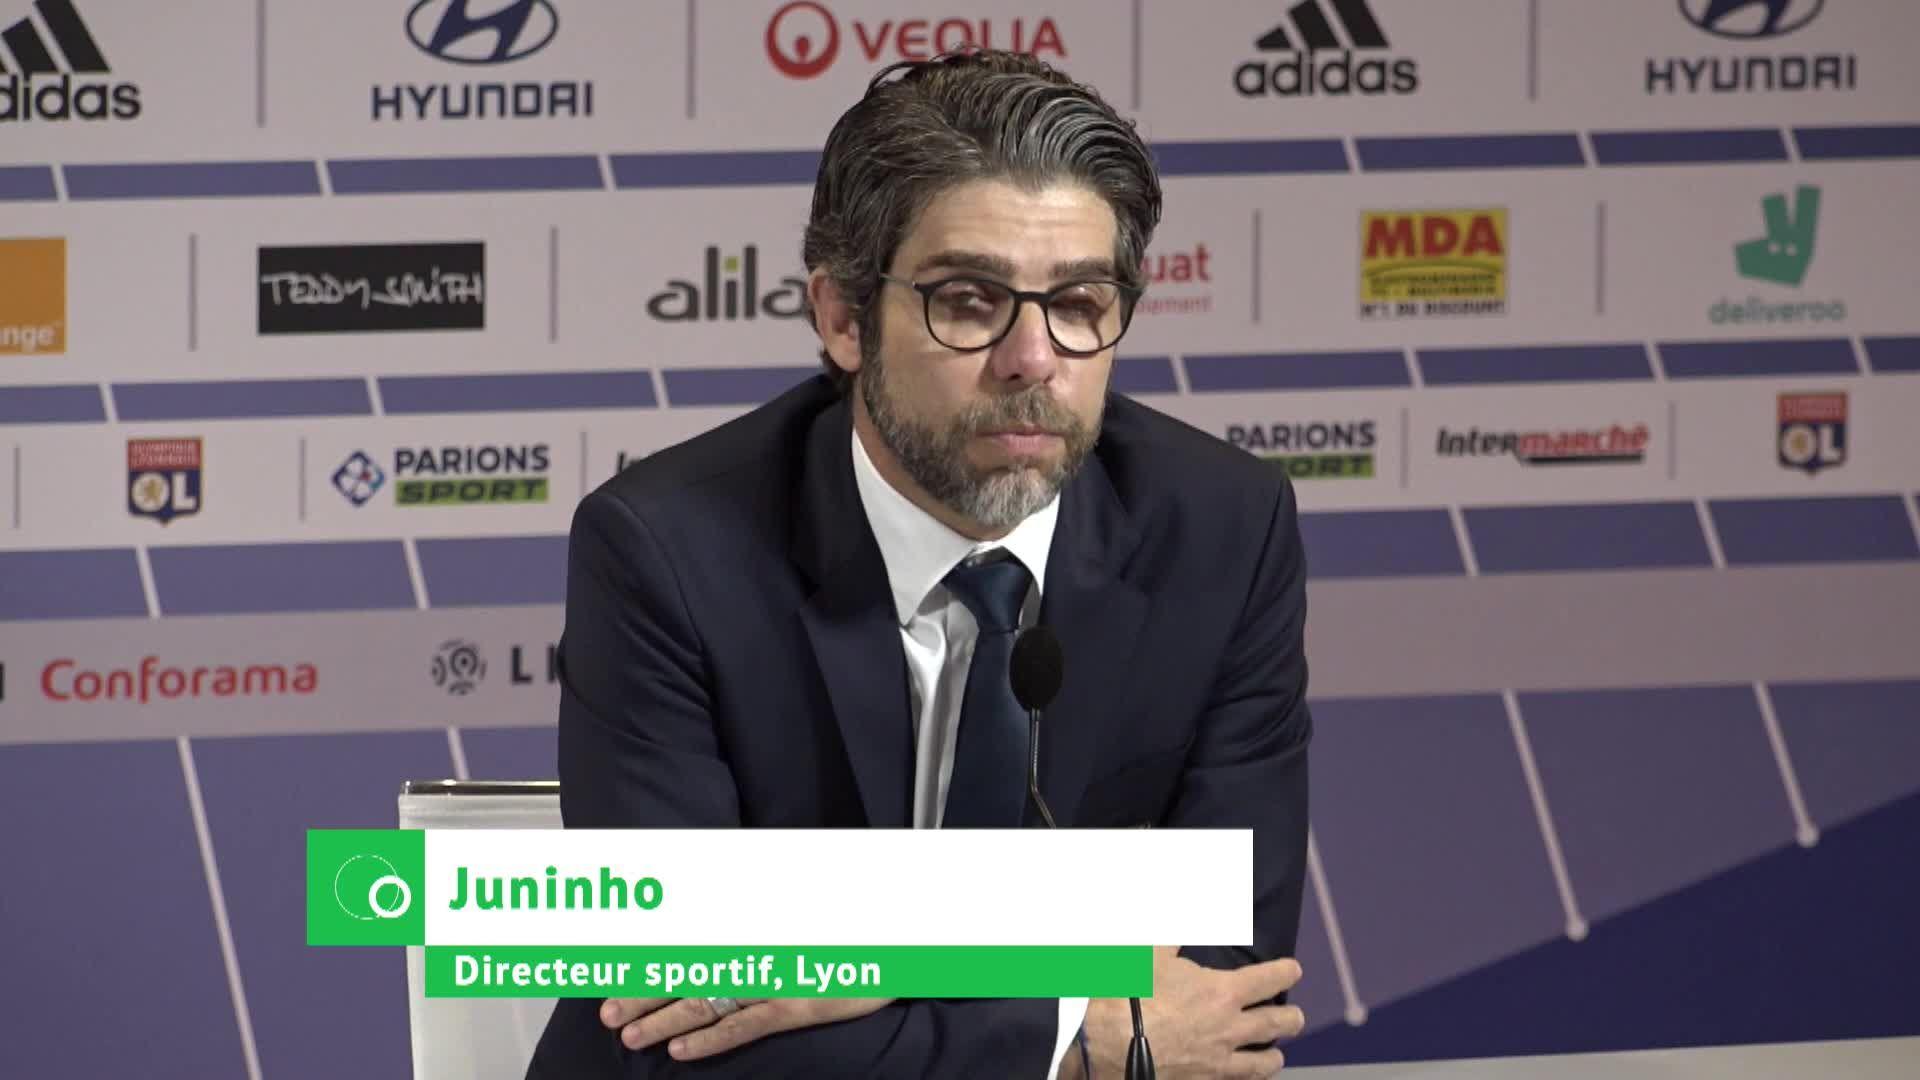 OL actu : Juninho, directeur sportif de l'Olympique Lyonnais